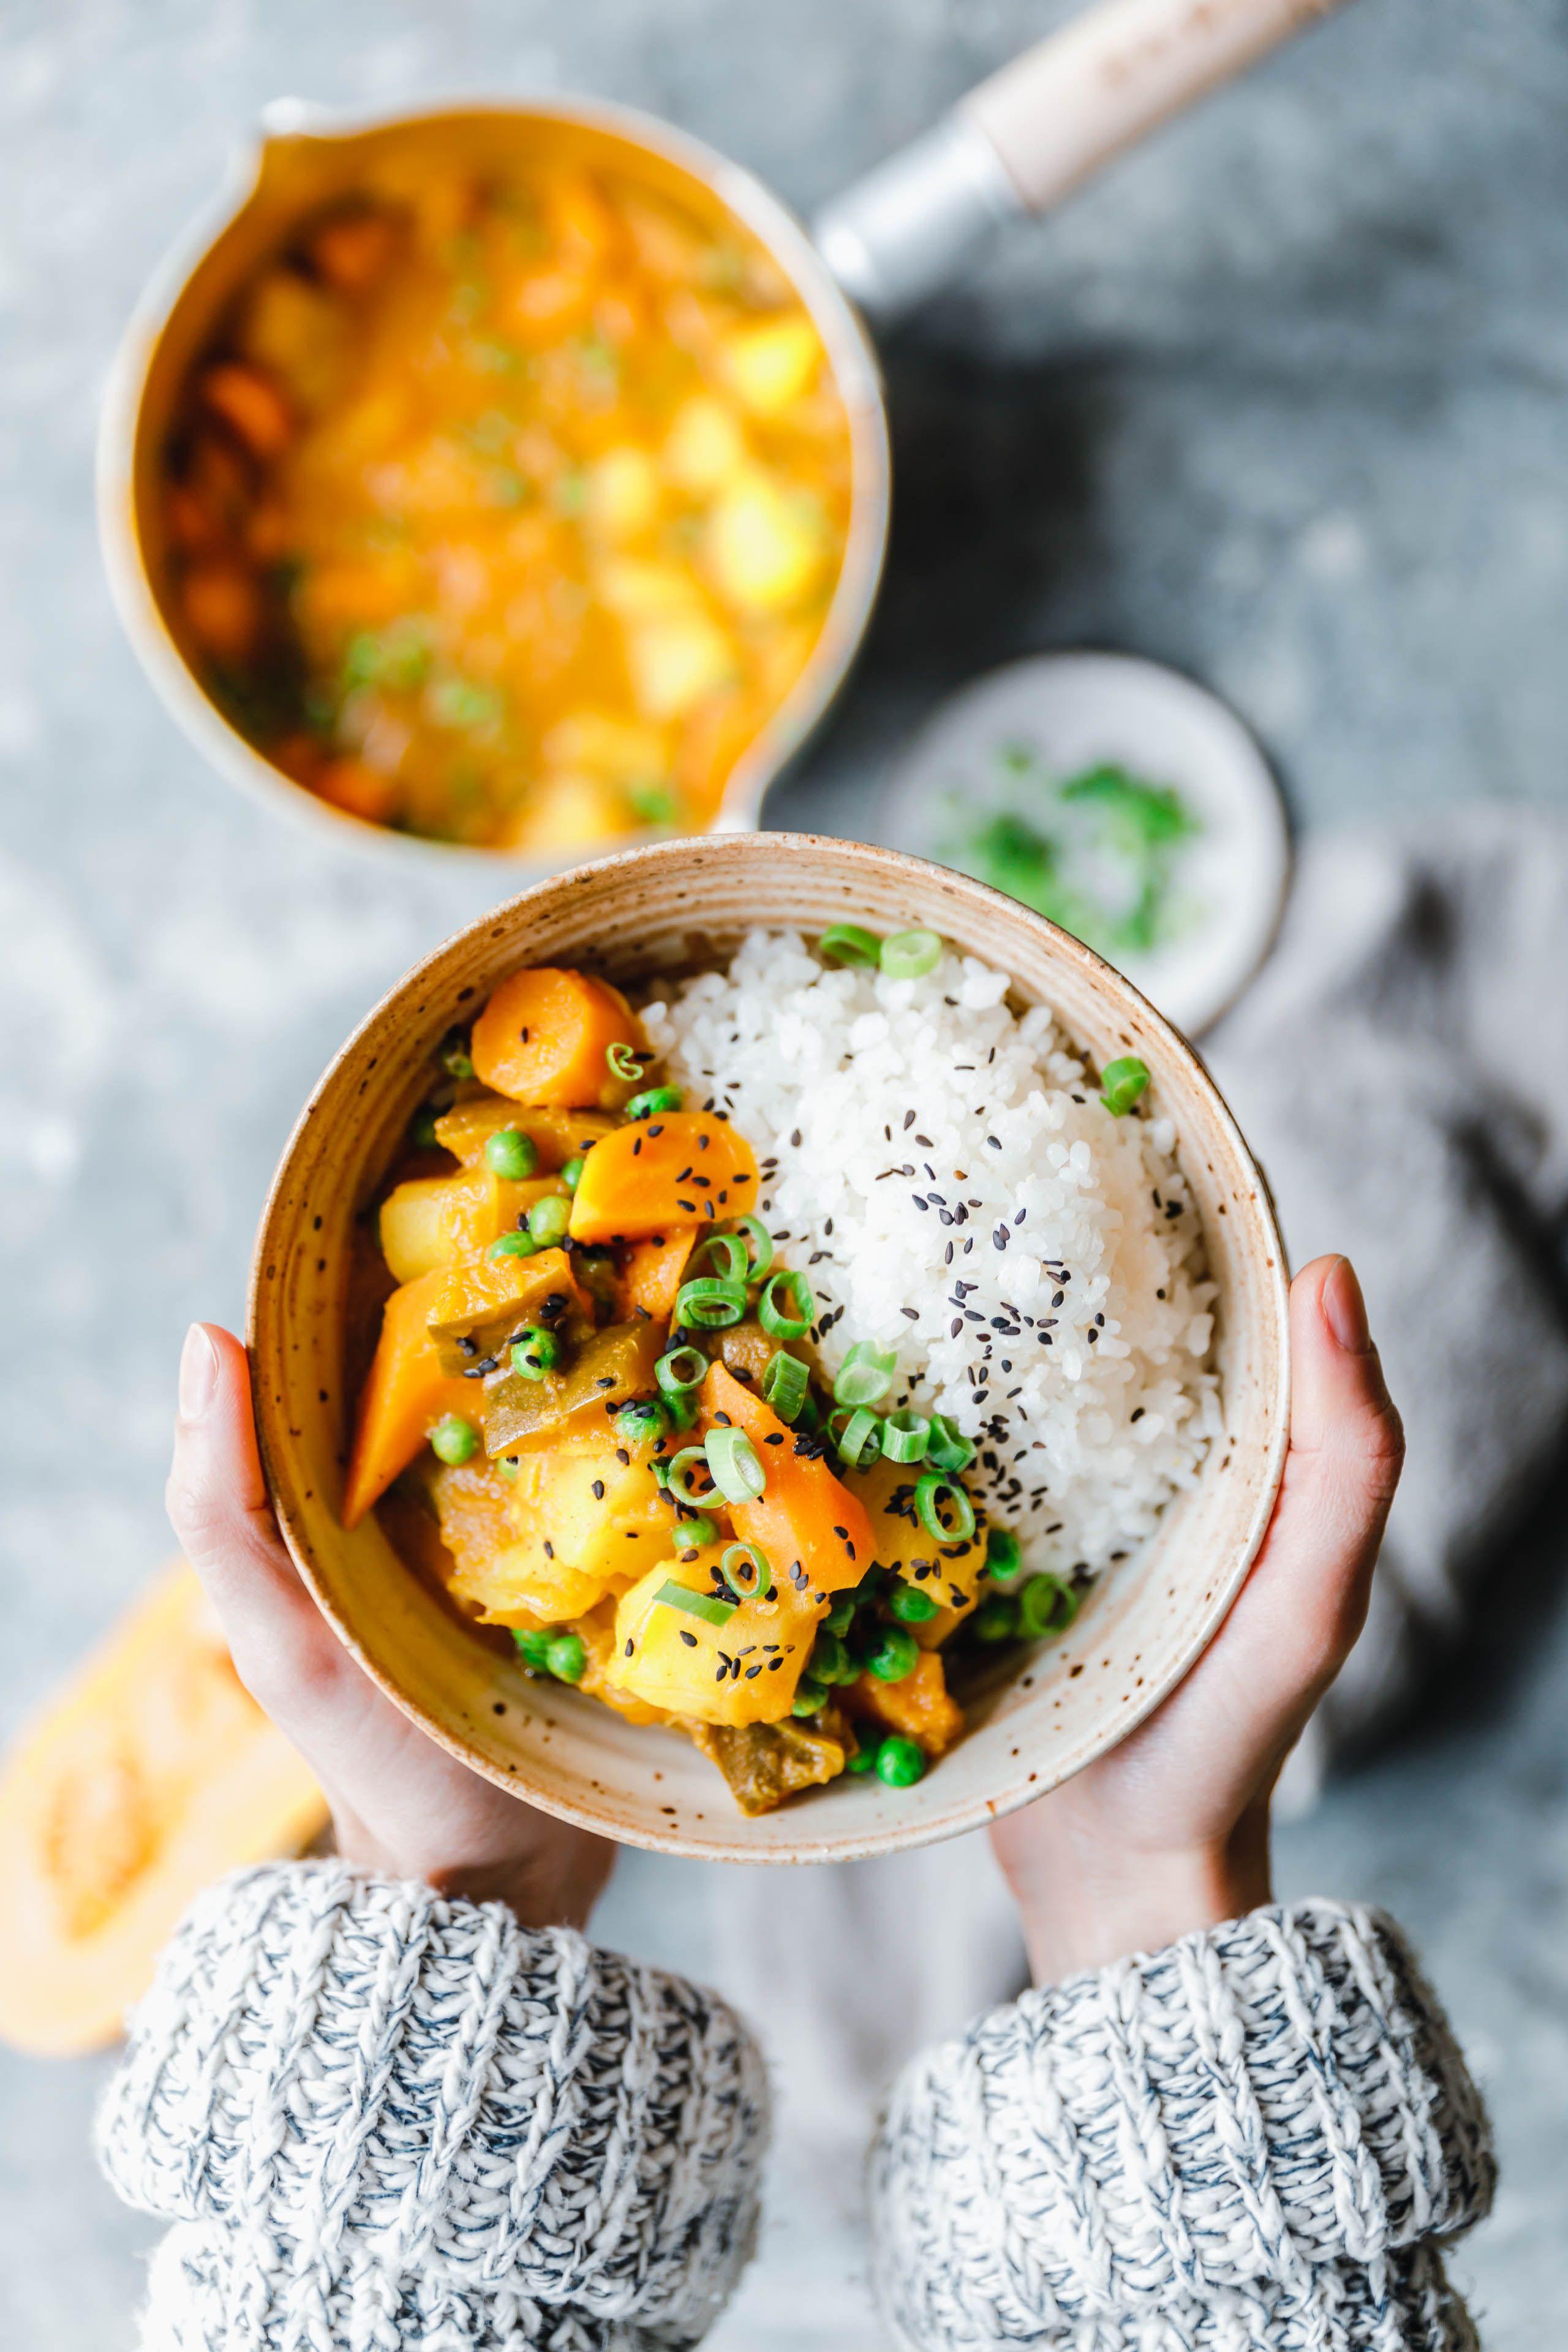 Japanisches Curry Mit Muskat Kurbis Eat This Foodblog Vegane Rezepte Stories Rezept Japanisches Curry Japanisches Essen Rezepte